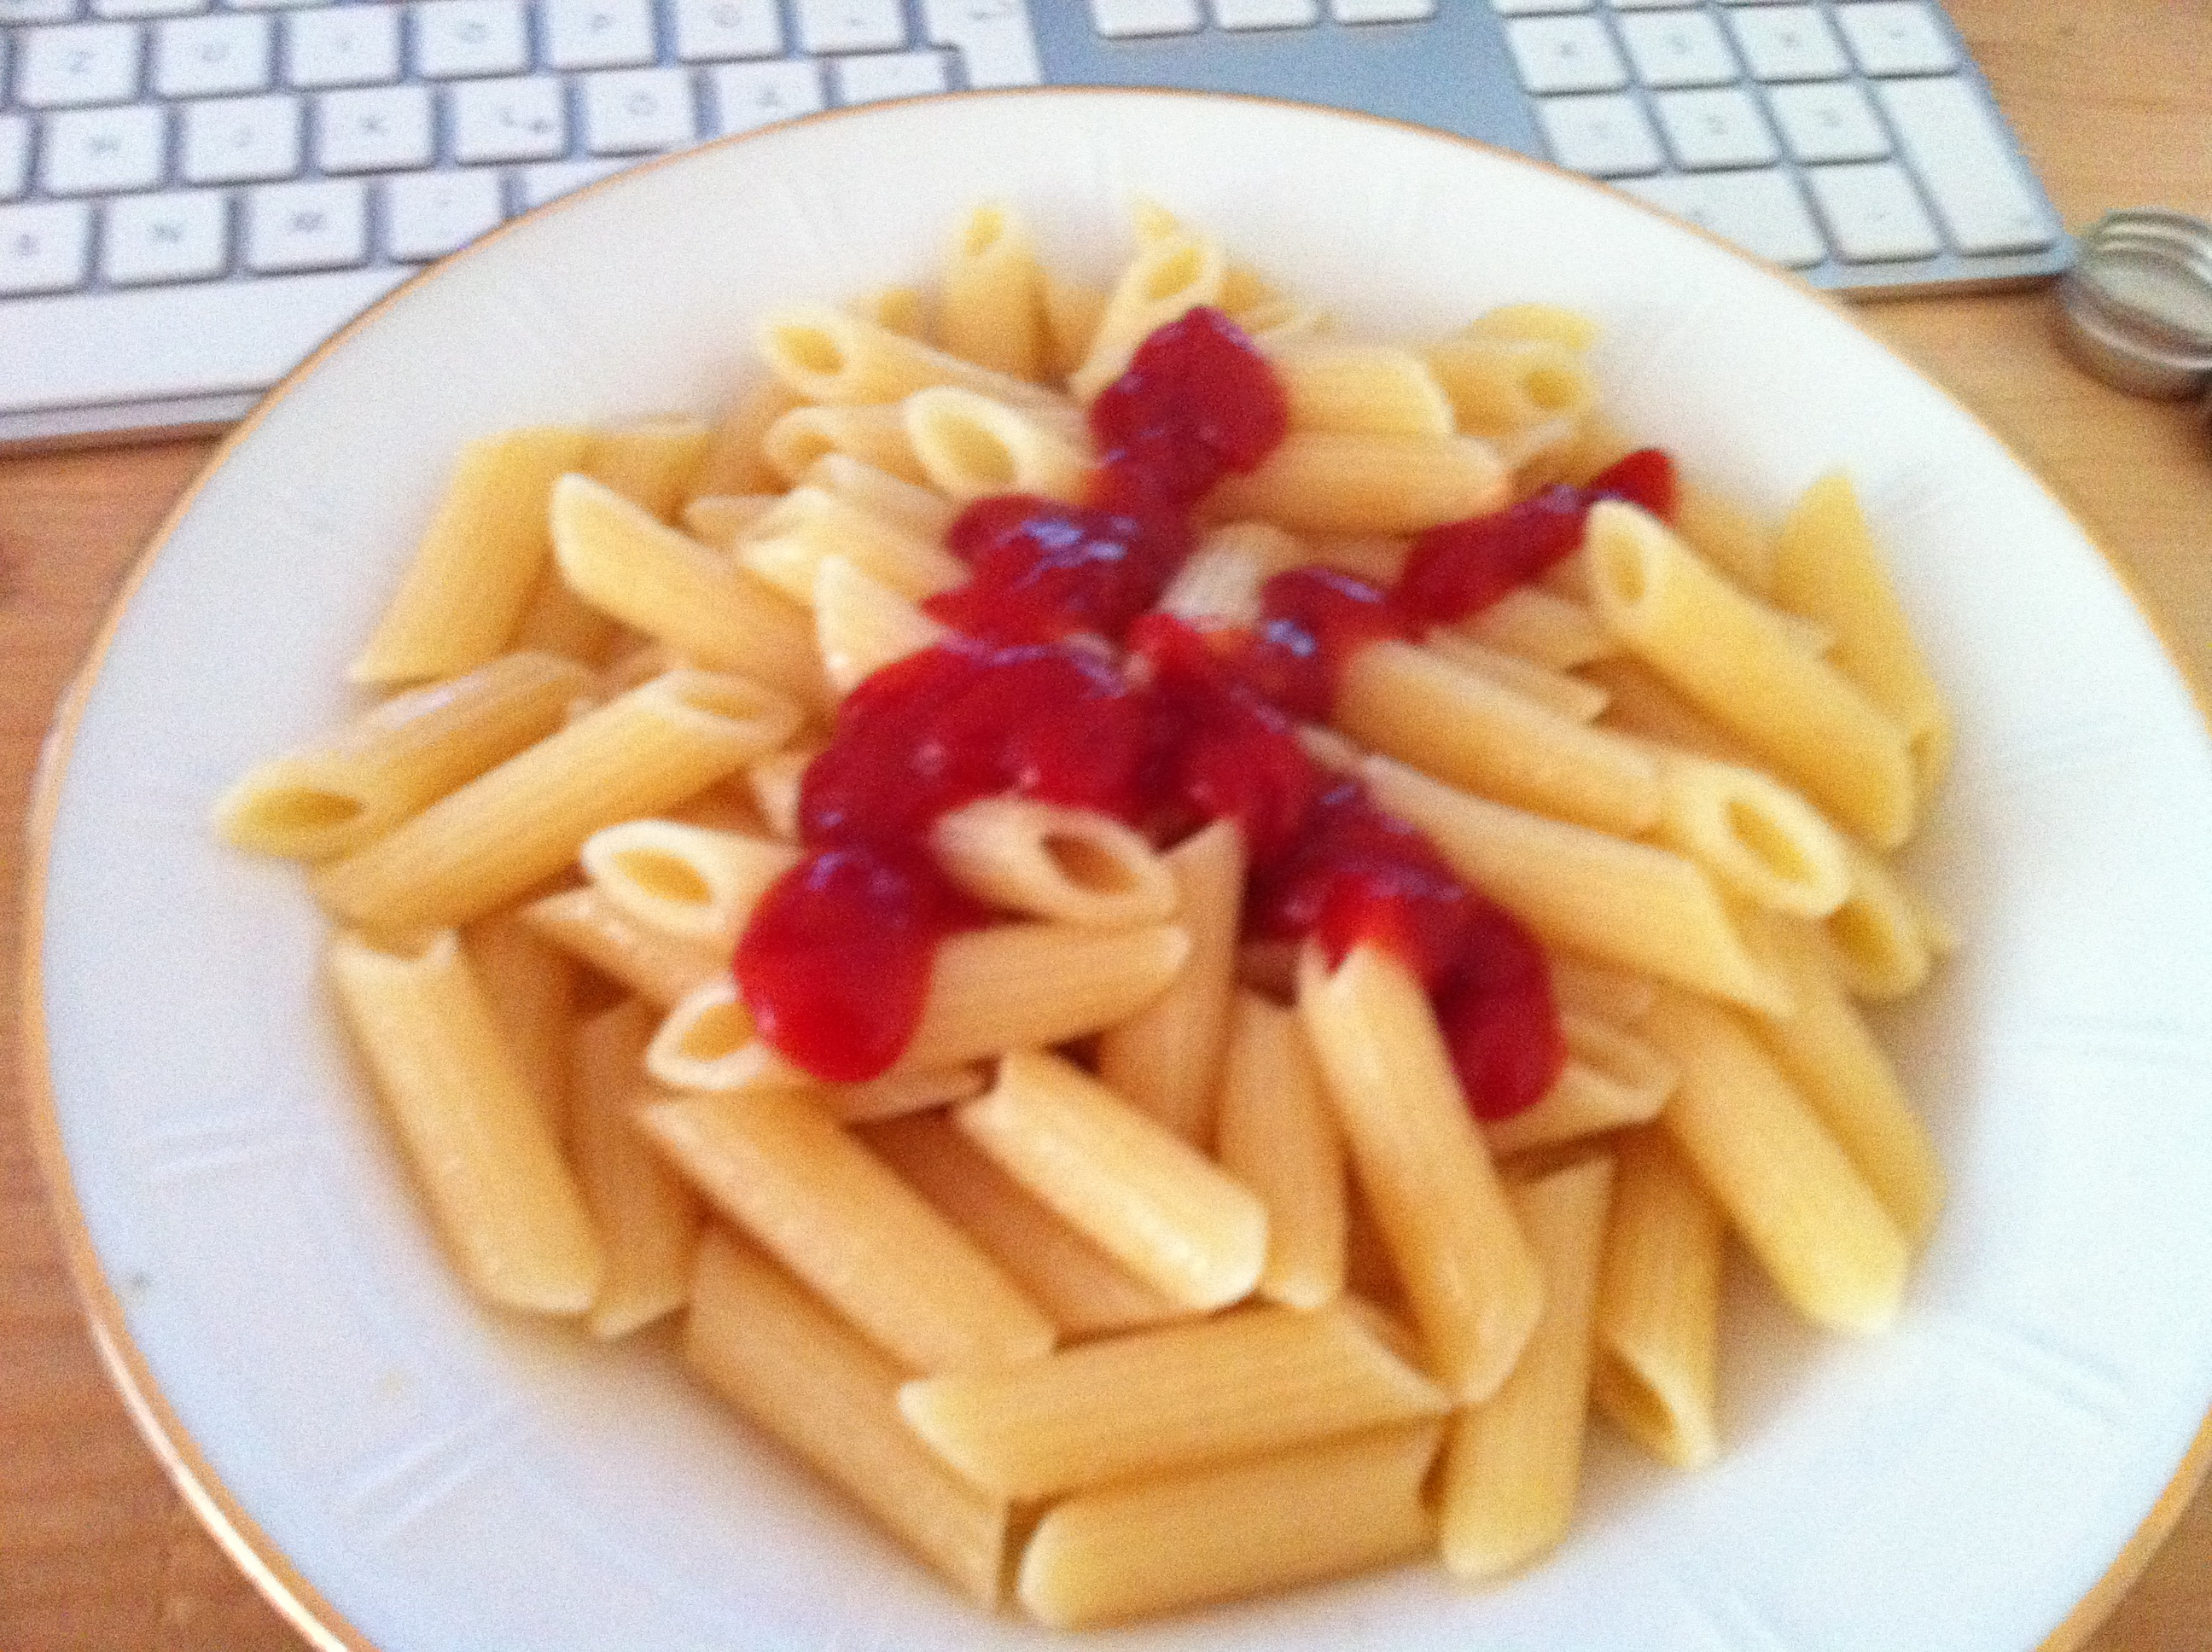 https://foodloader.net/marv1n_2010-10-12_Nudeln_k.jpg